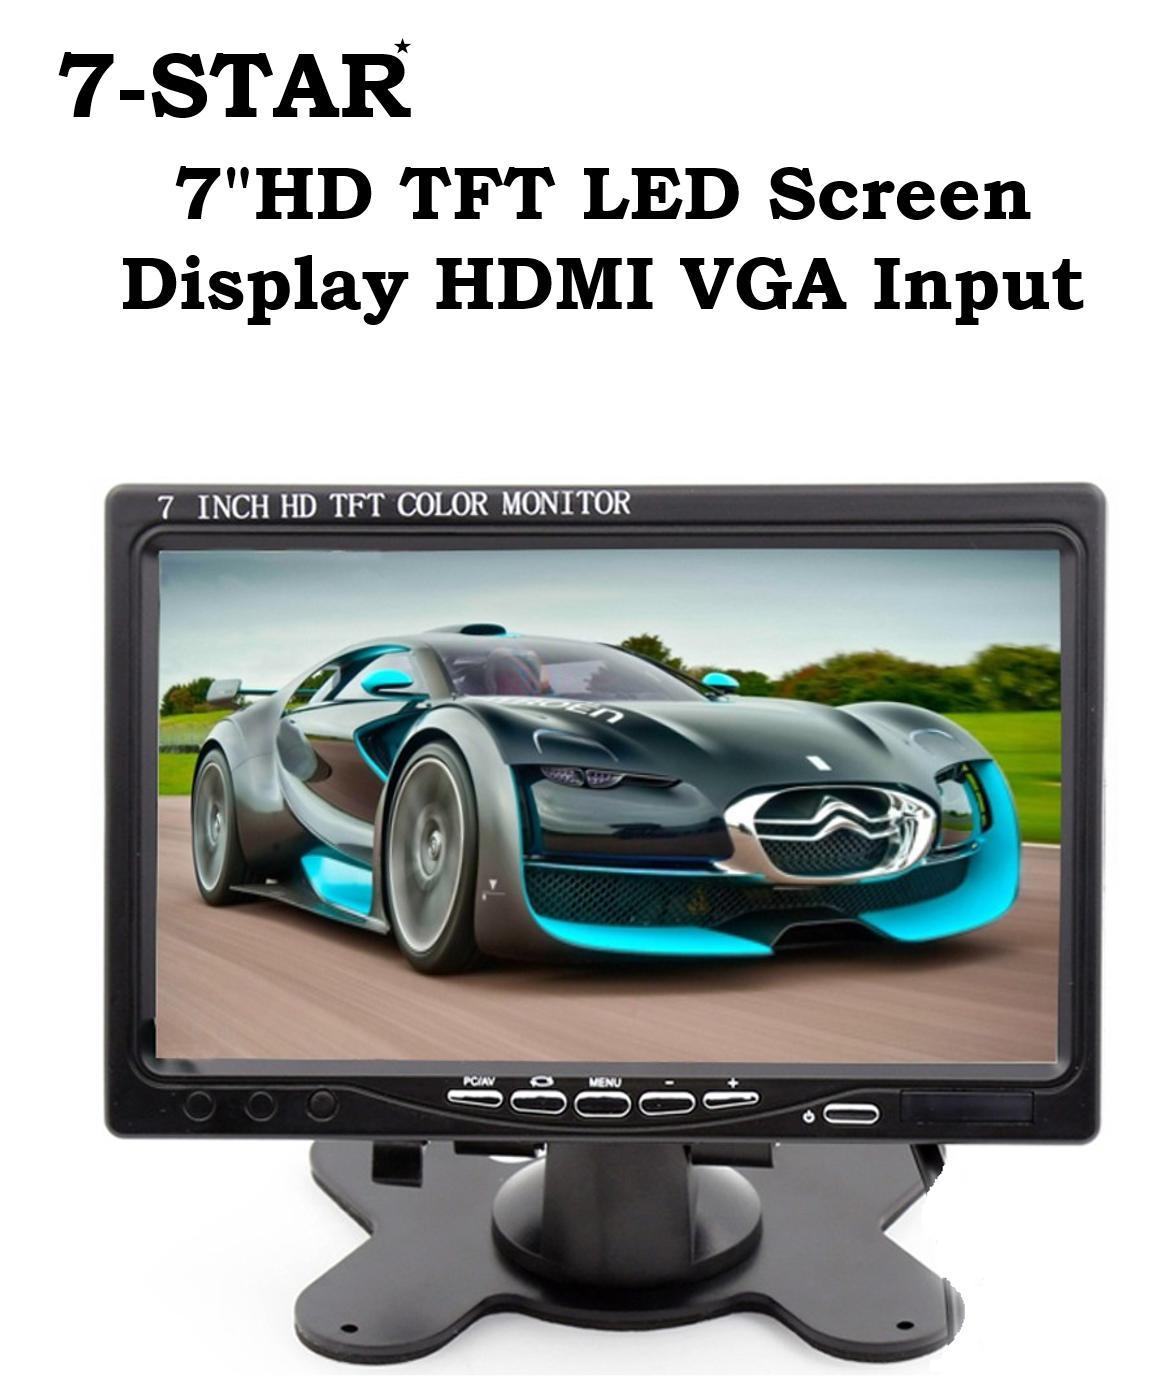 7 inch HDTFT LED Screen Display HDMI VGA Input - 7inch LED Monitor